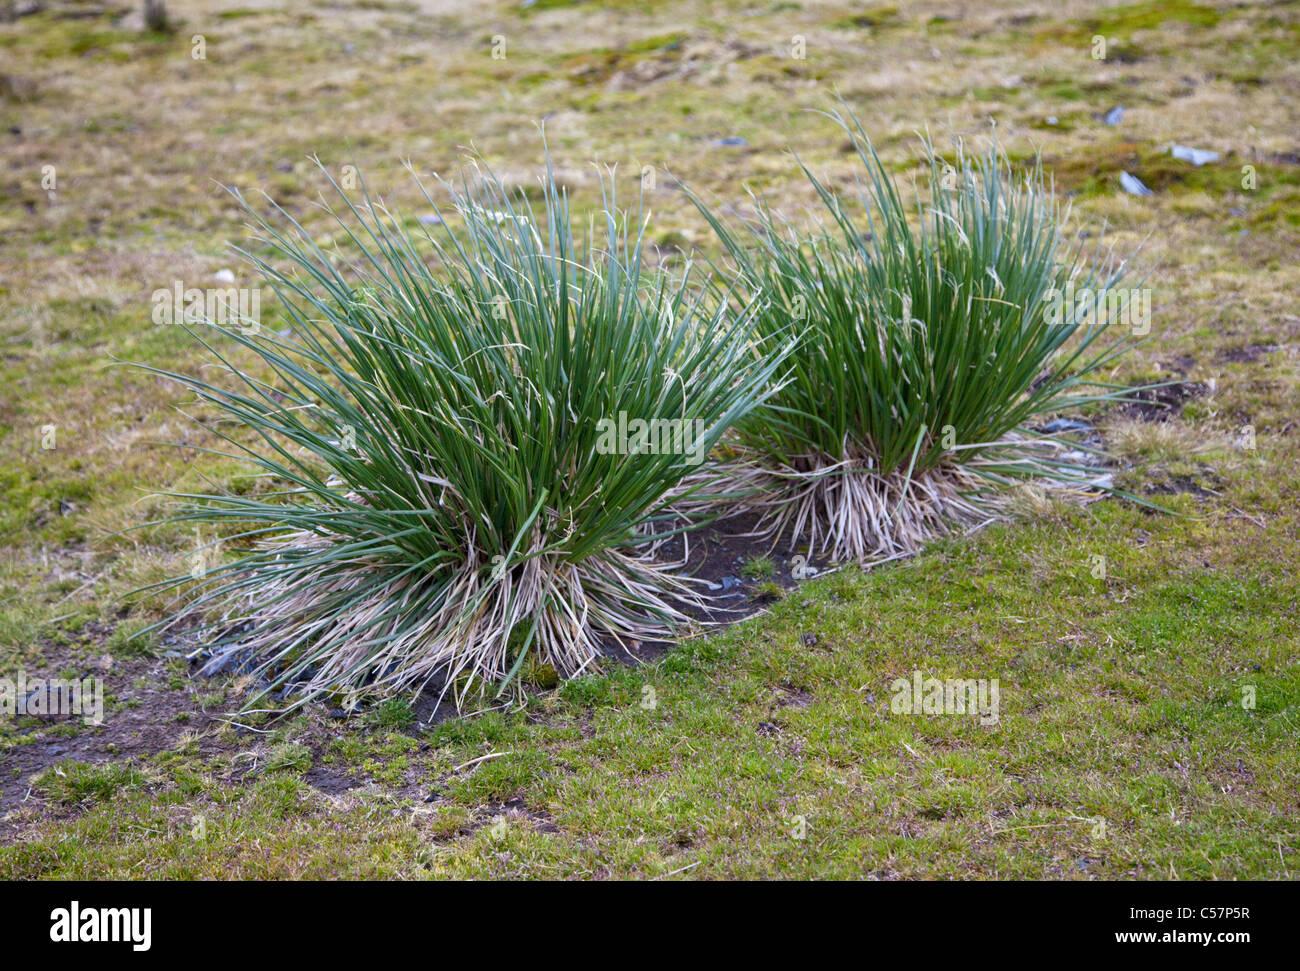 Tussock Grass, South Georgia - Stock Image